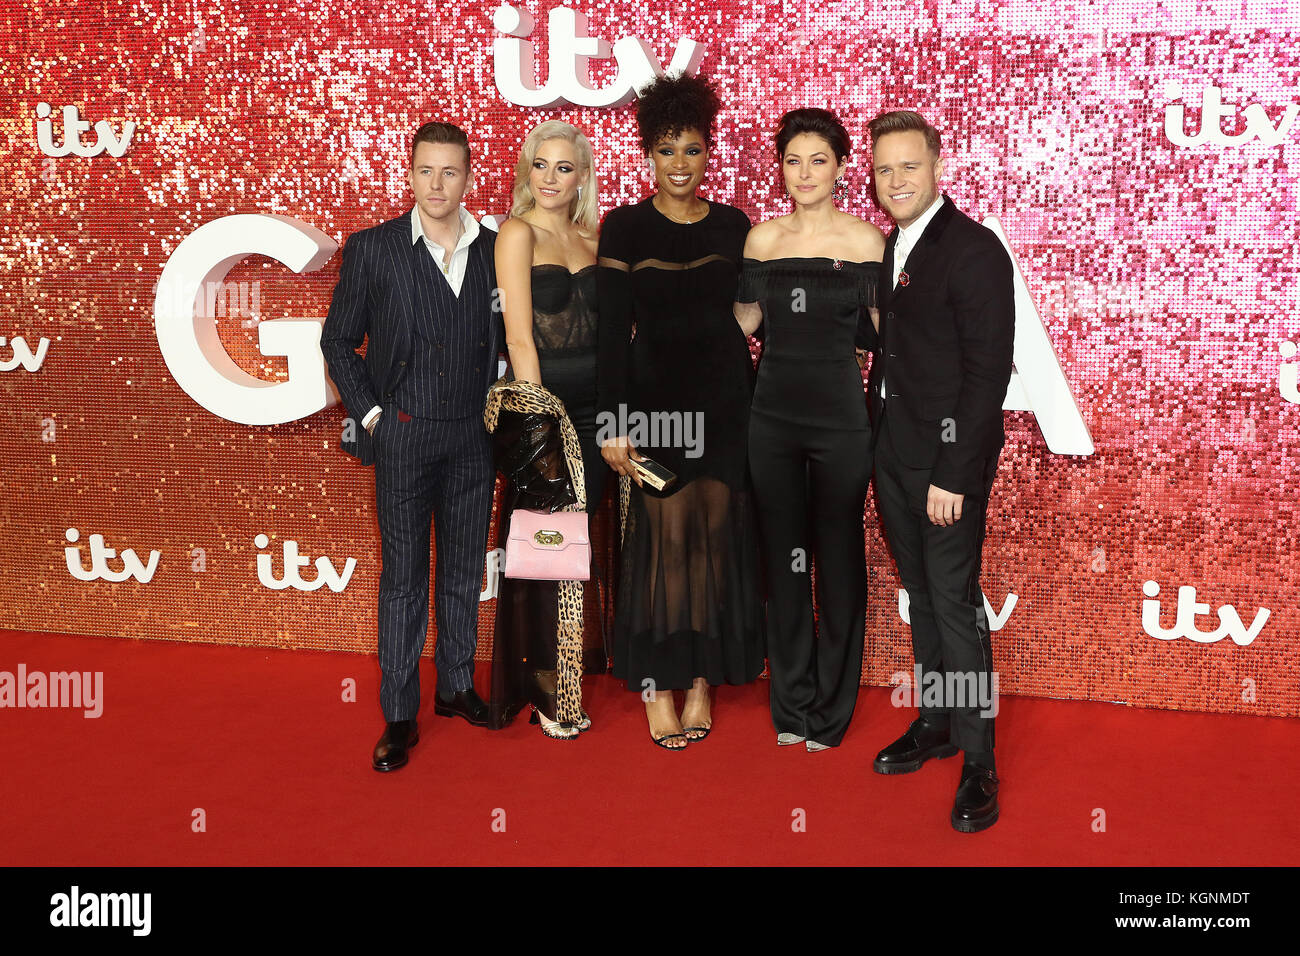 London, UK. 9th November, 2017. The Voice, Danny Jones, Pixie Lott, Jennifer Hudson, Emma Willis, Olly Murs, ITV - Stock Image